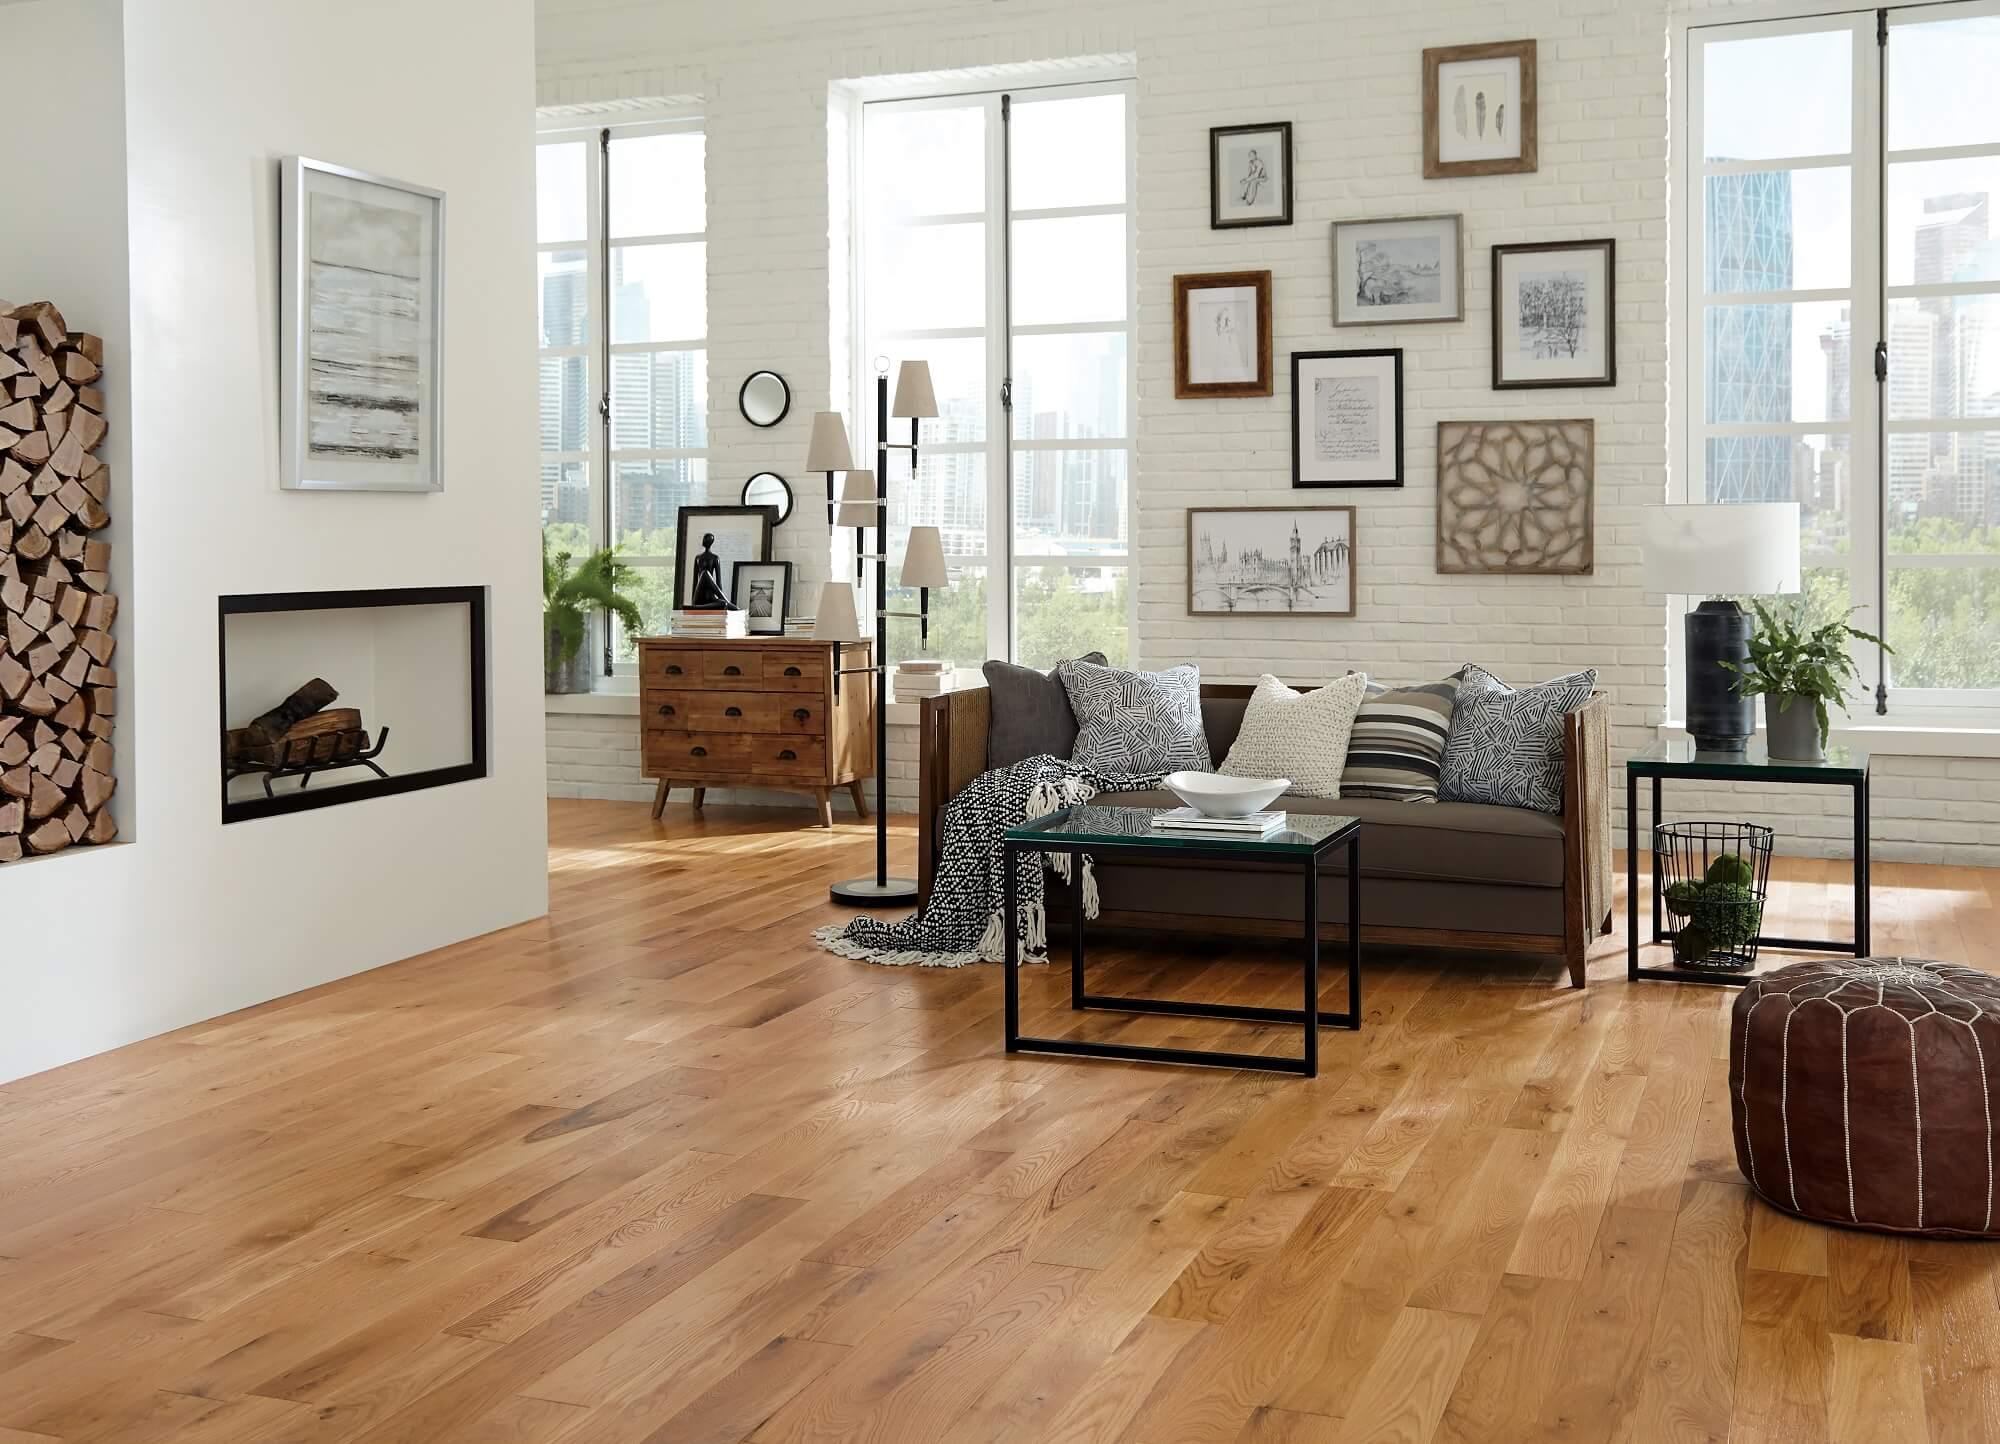 Home Somerset Hardwood Flooring